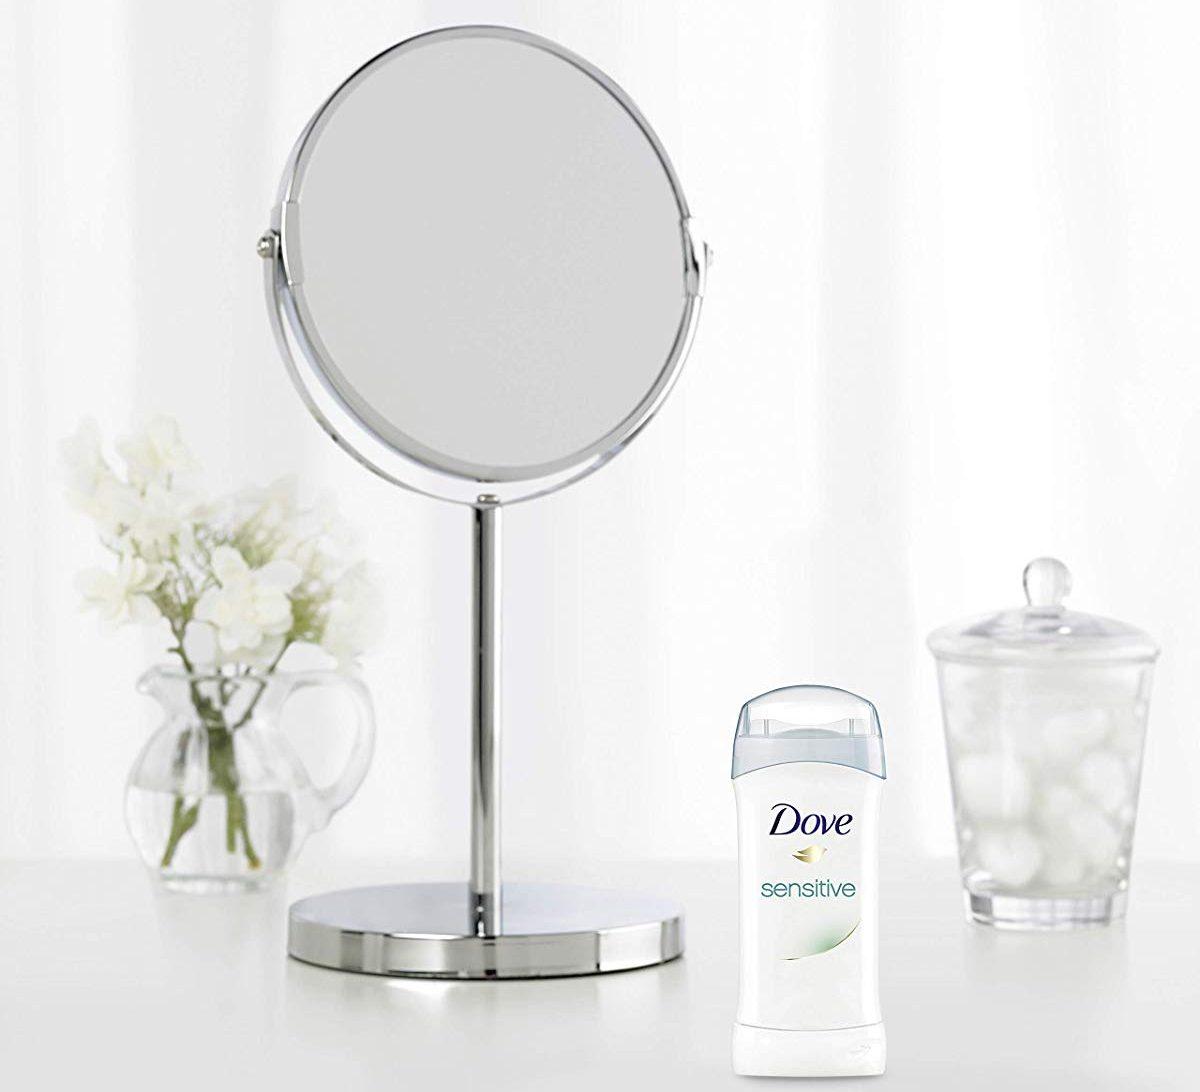 Dove deodorant by mirror